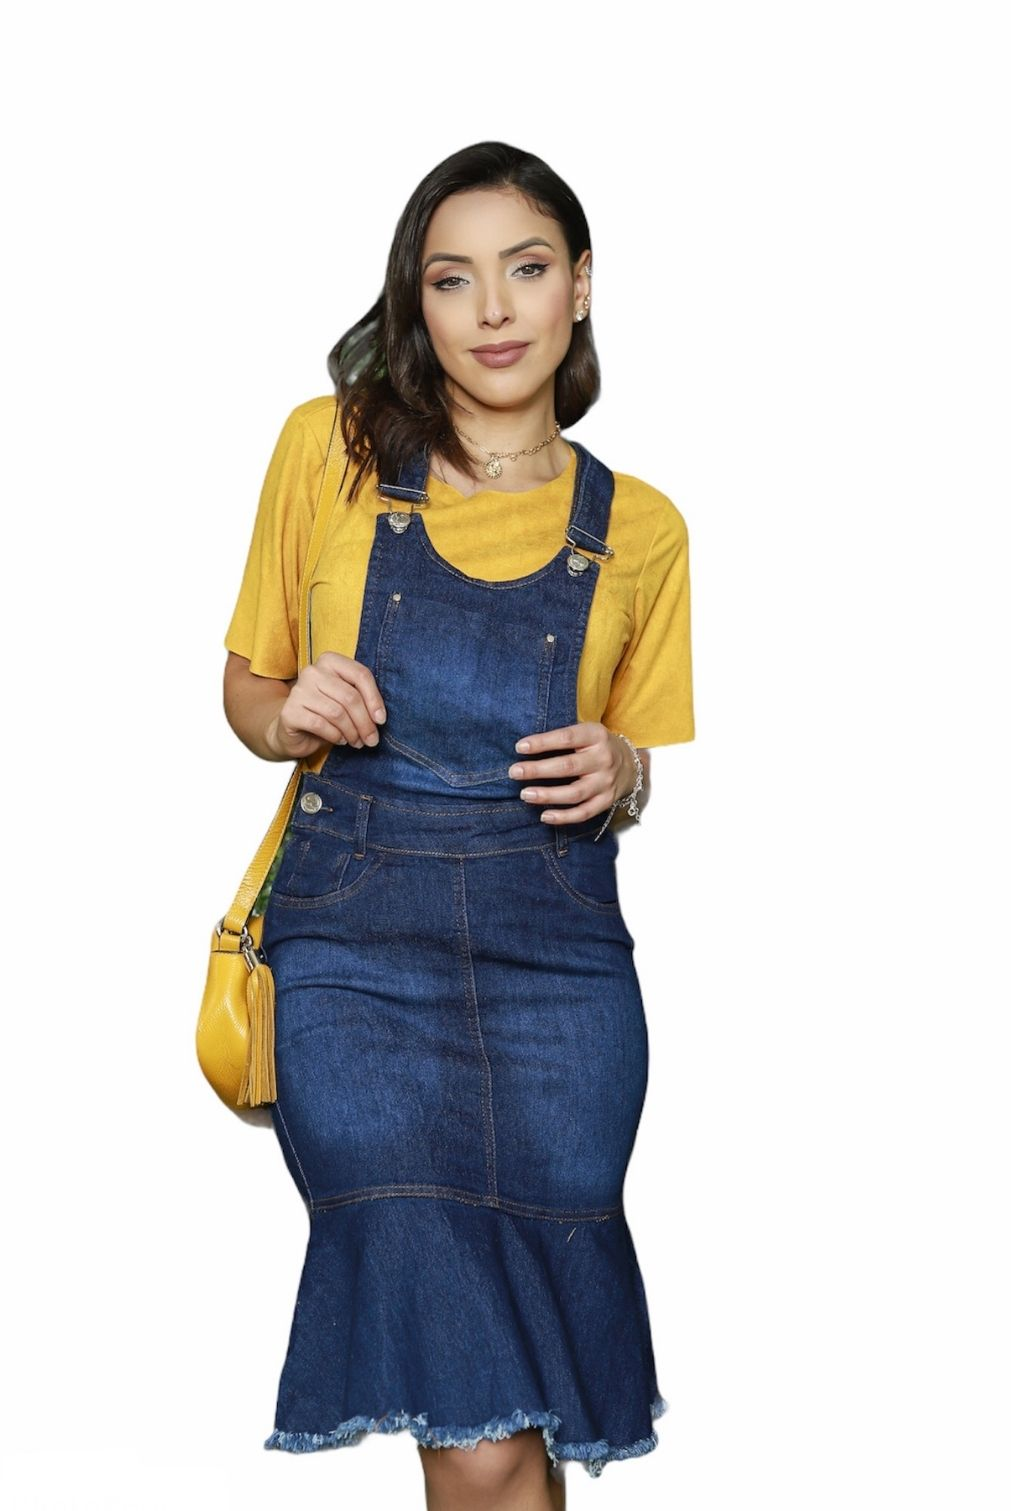 Jardineira Jeans Feminina Moda Evangélica Barra Desfiada Midi Bolso Frontal e Babado  - ModaStore | Moda Feminina